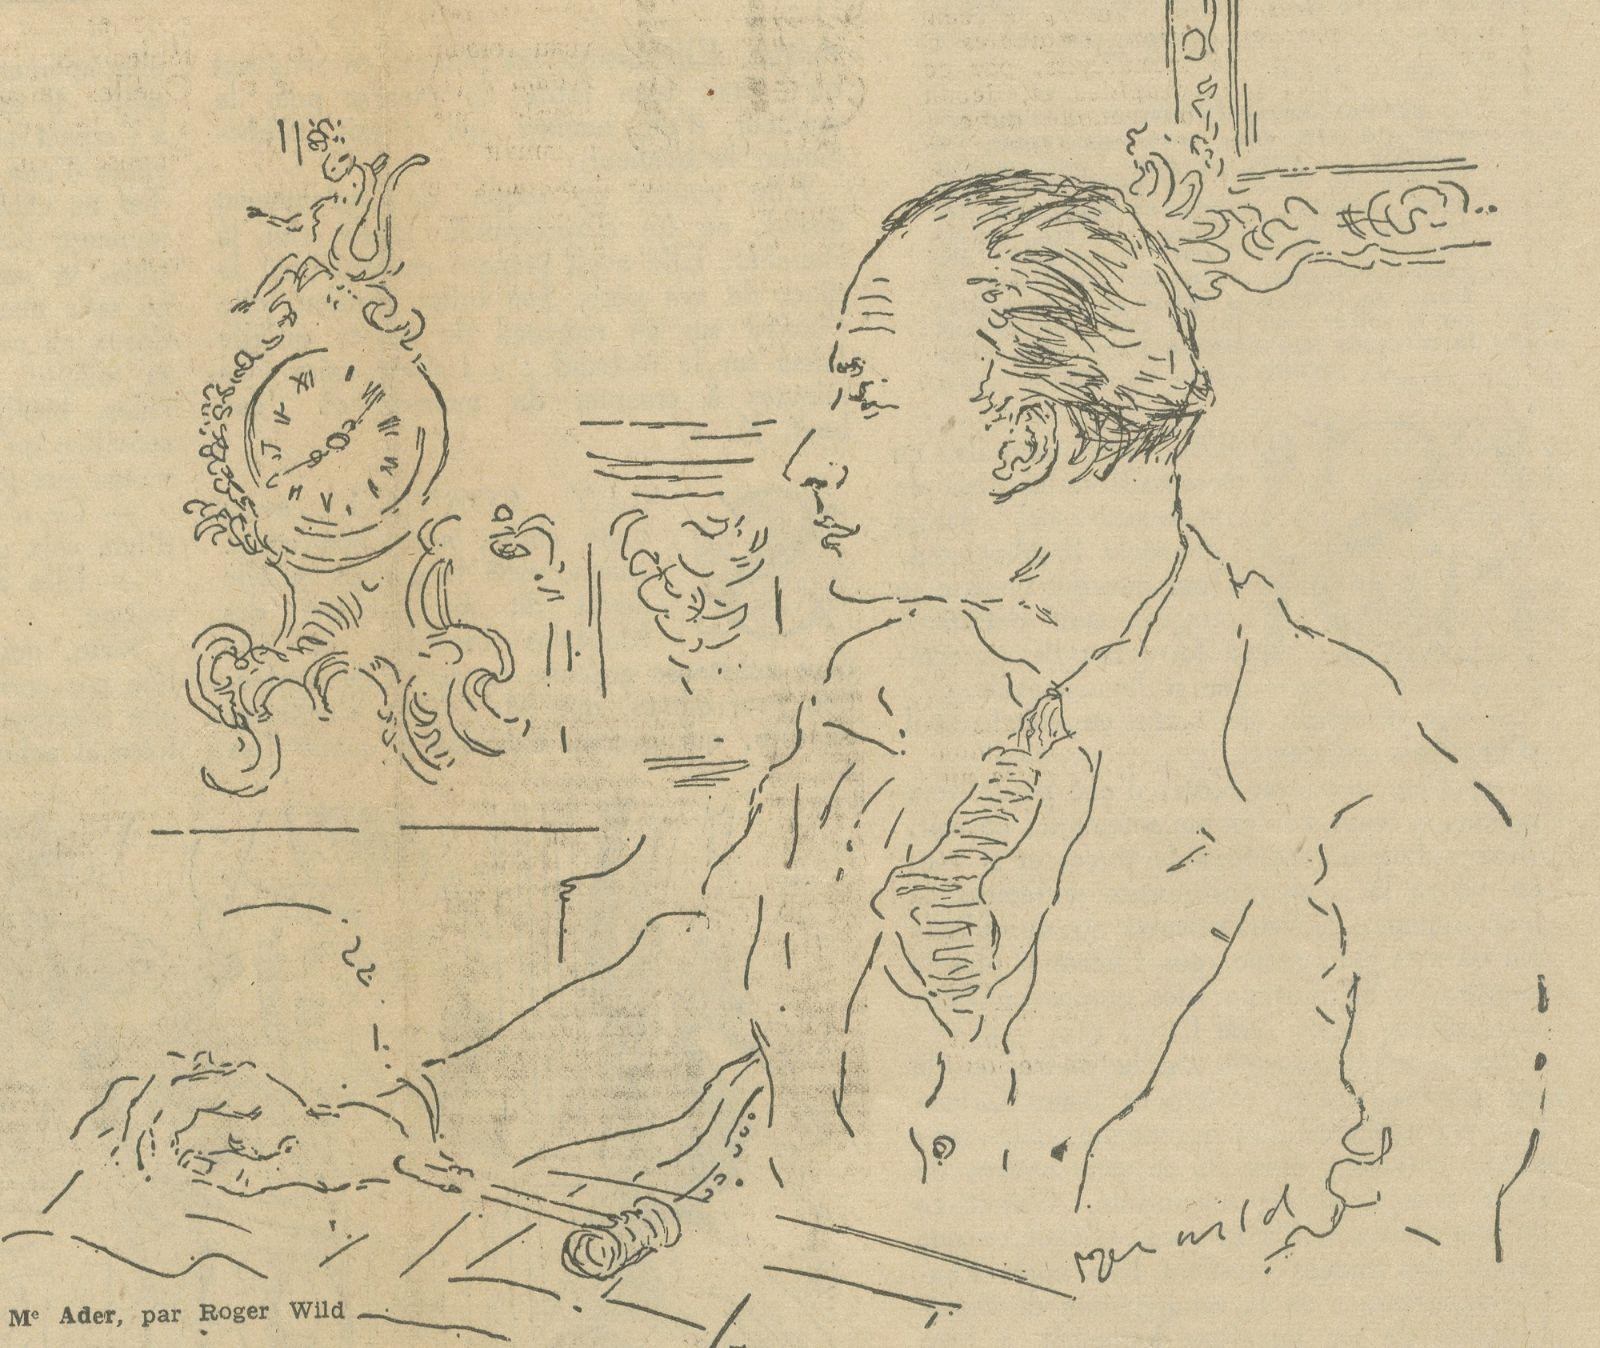 Etienne Ader